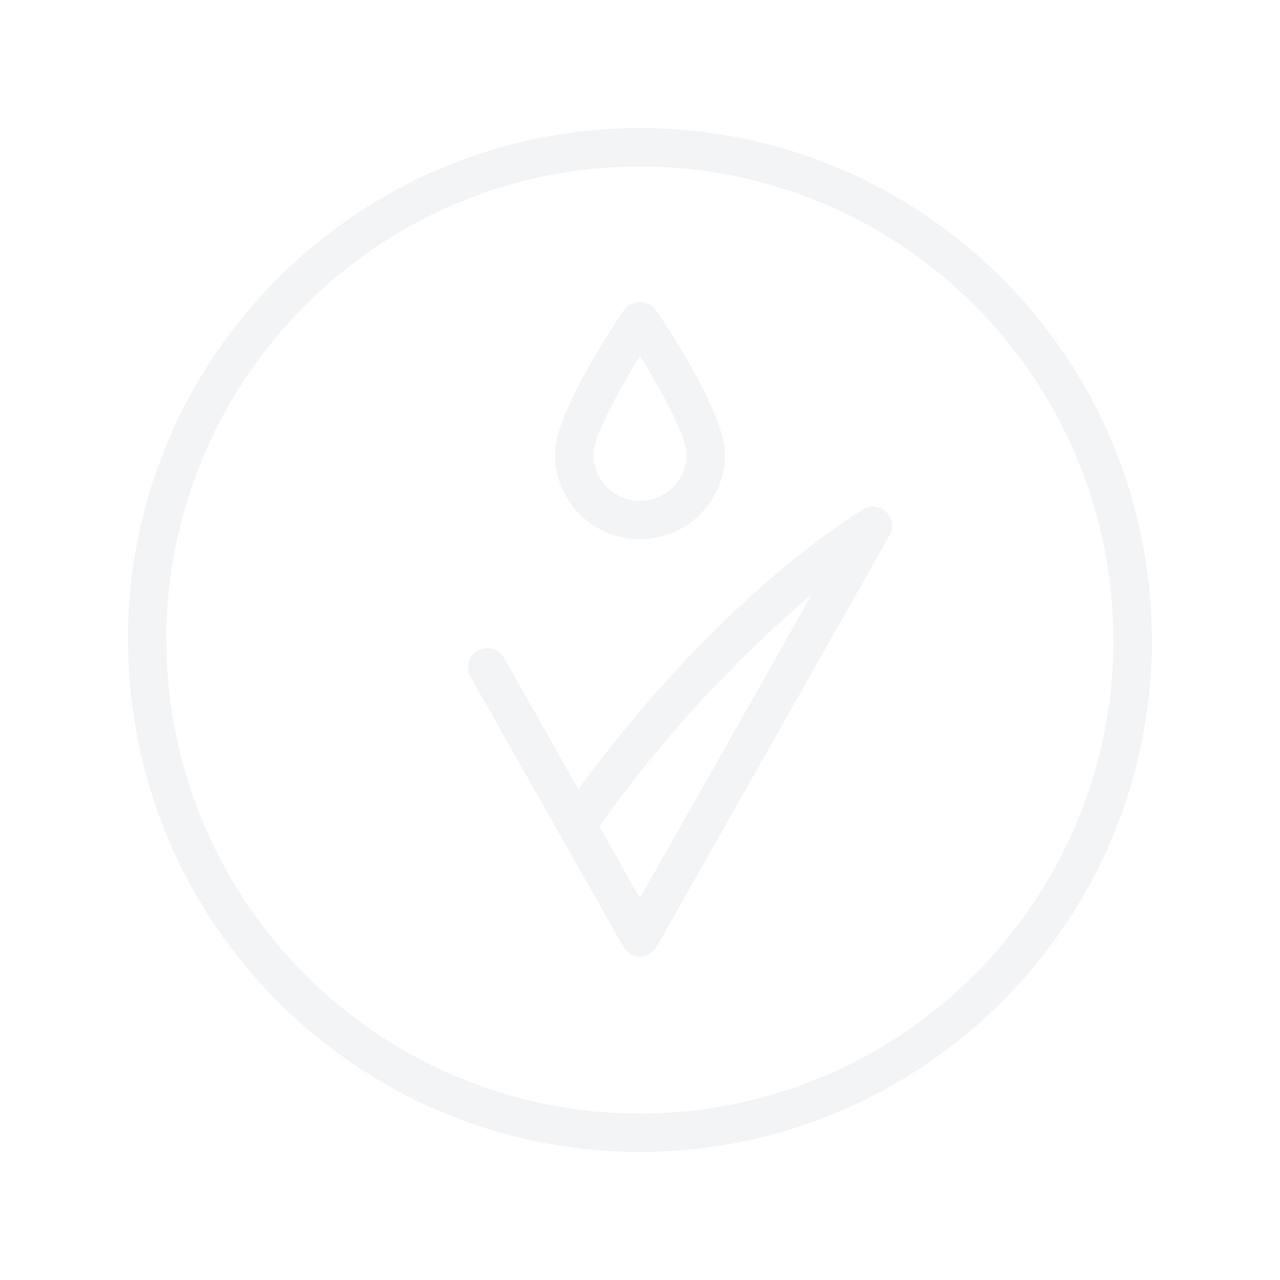 SUPERMOOD Beauty Sleep Youth Restoring Eye Serum 15ml